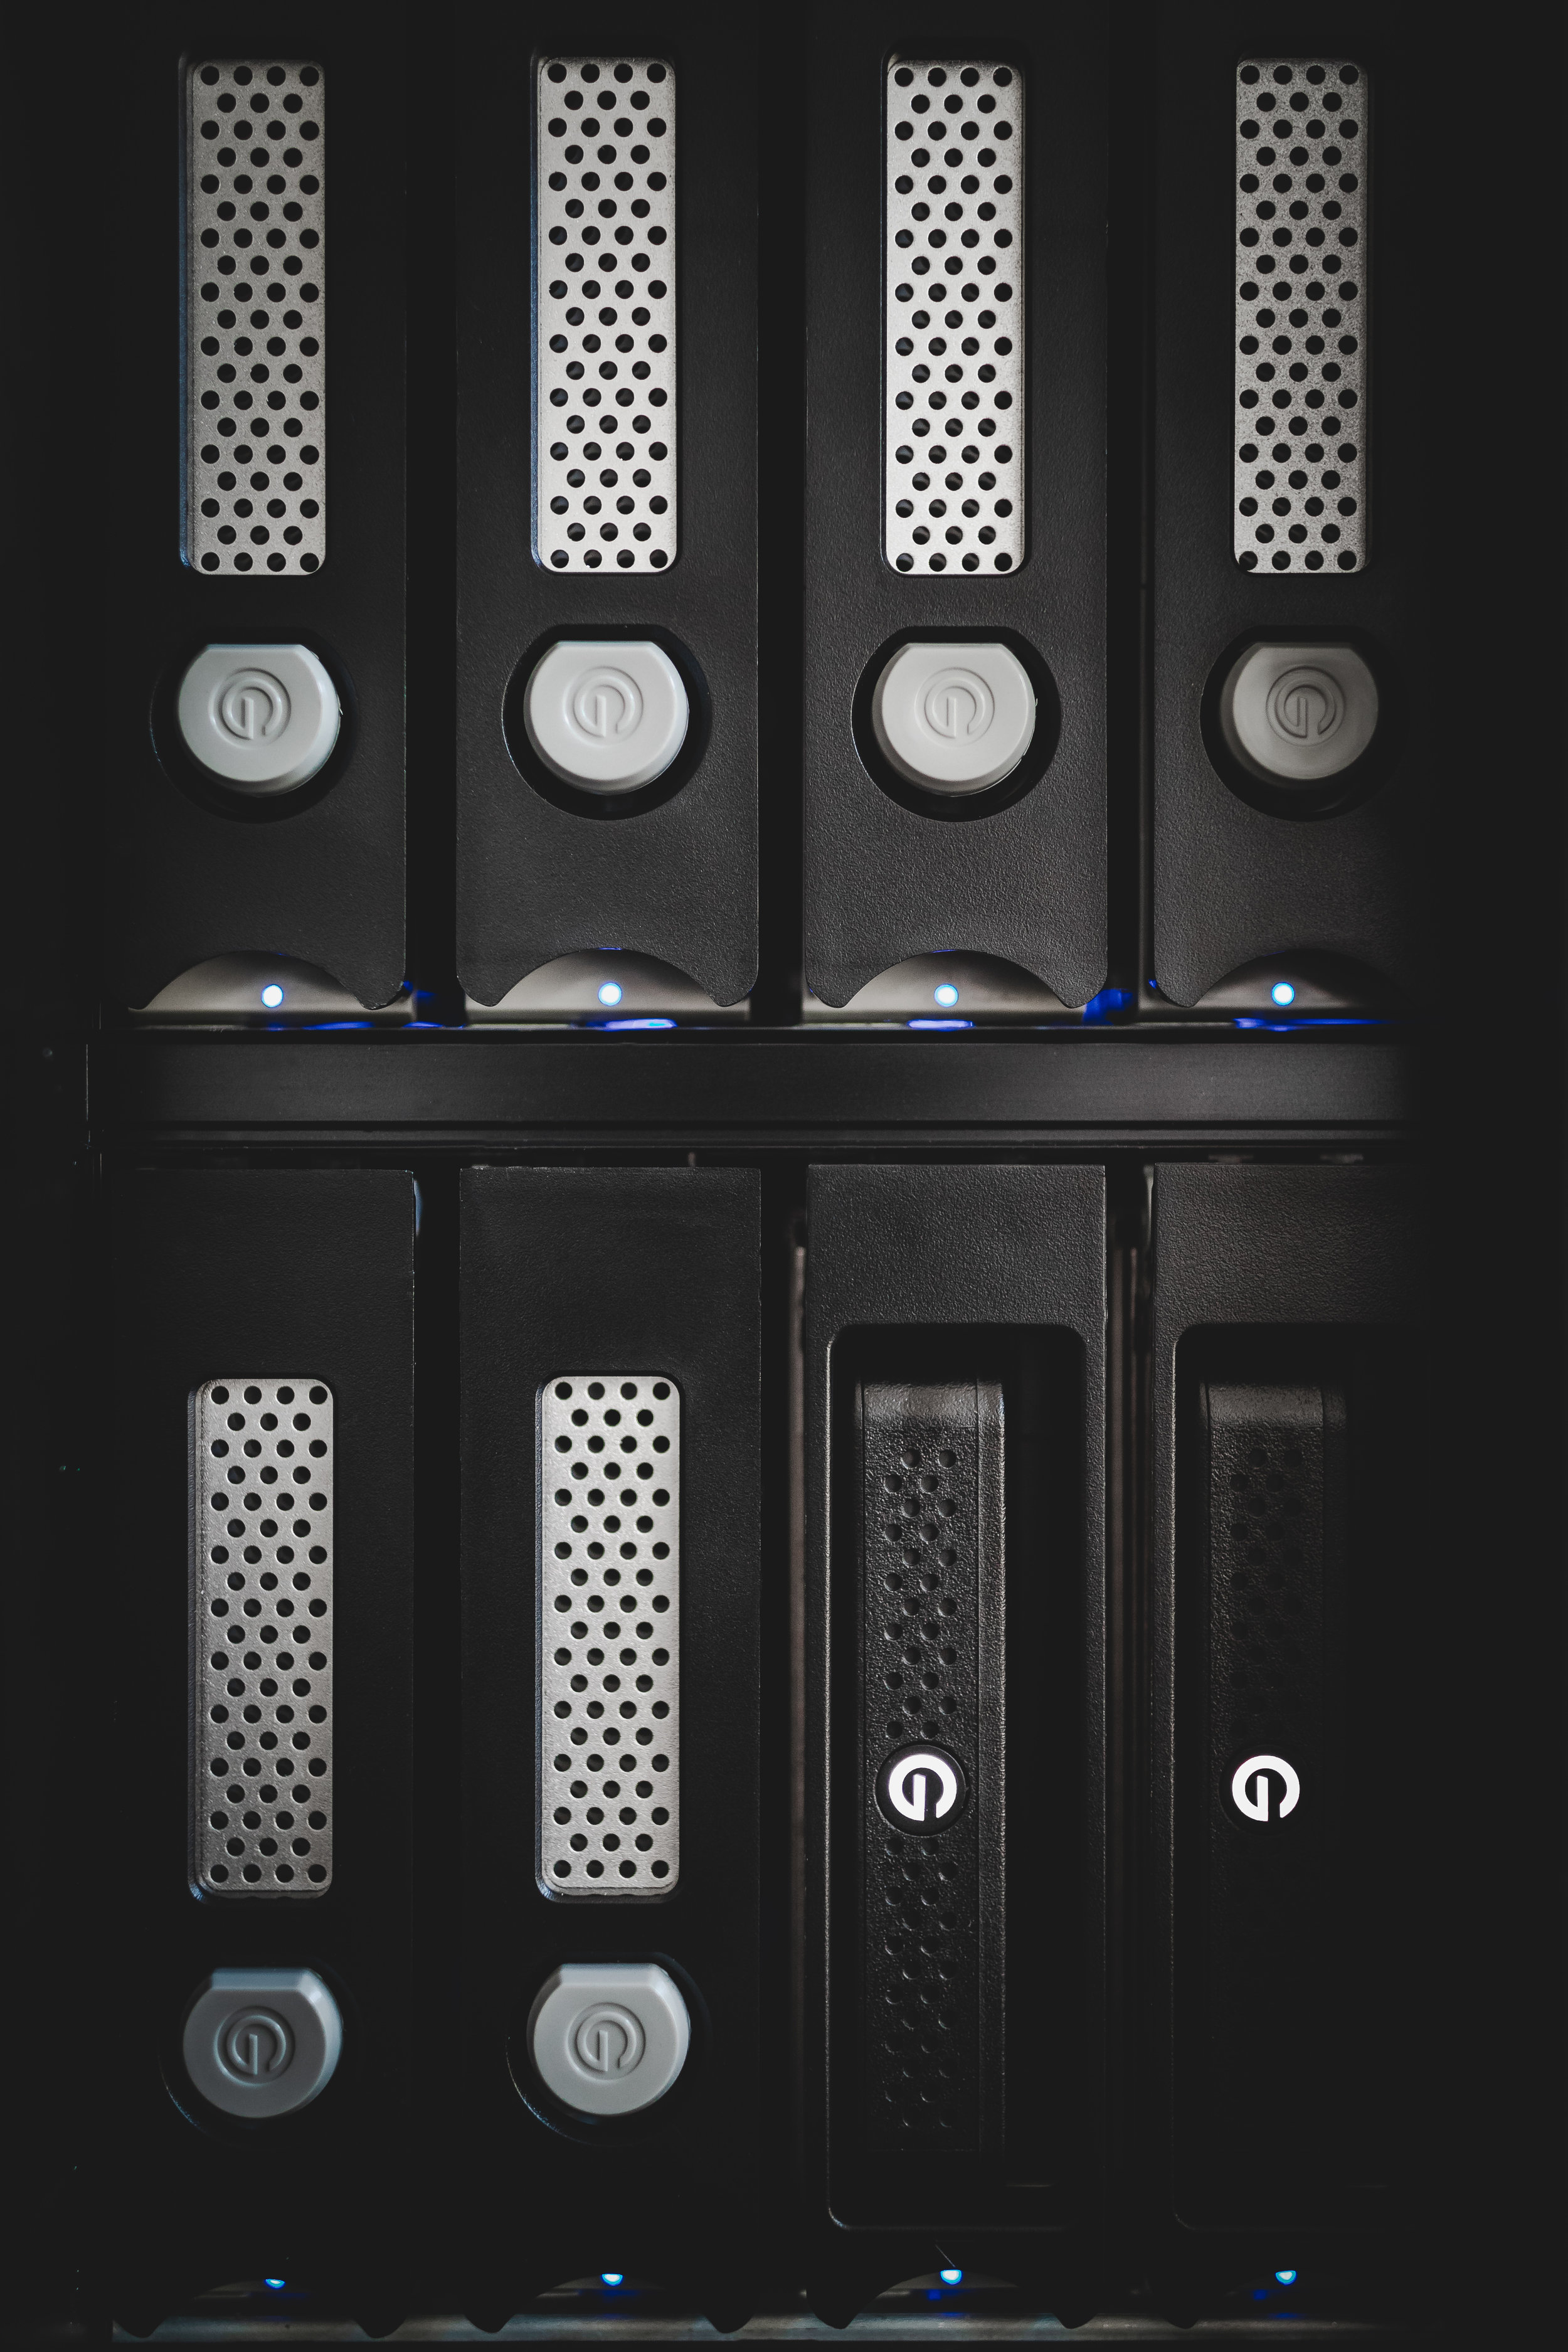 G-SPEED Shuttle XL: Enterprise-class drives and ev series adapters